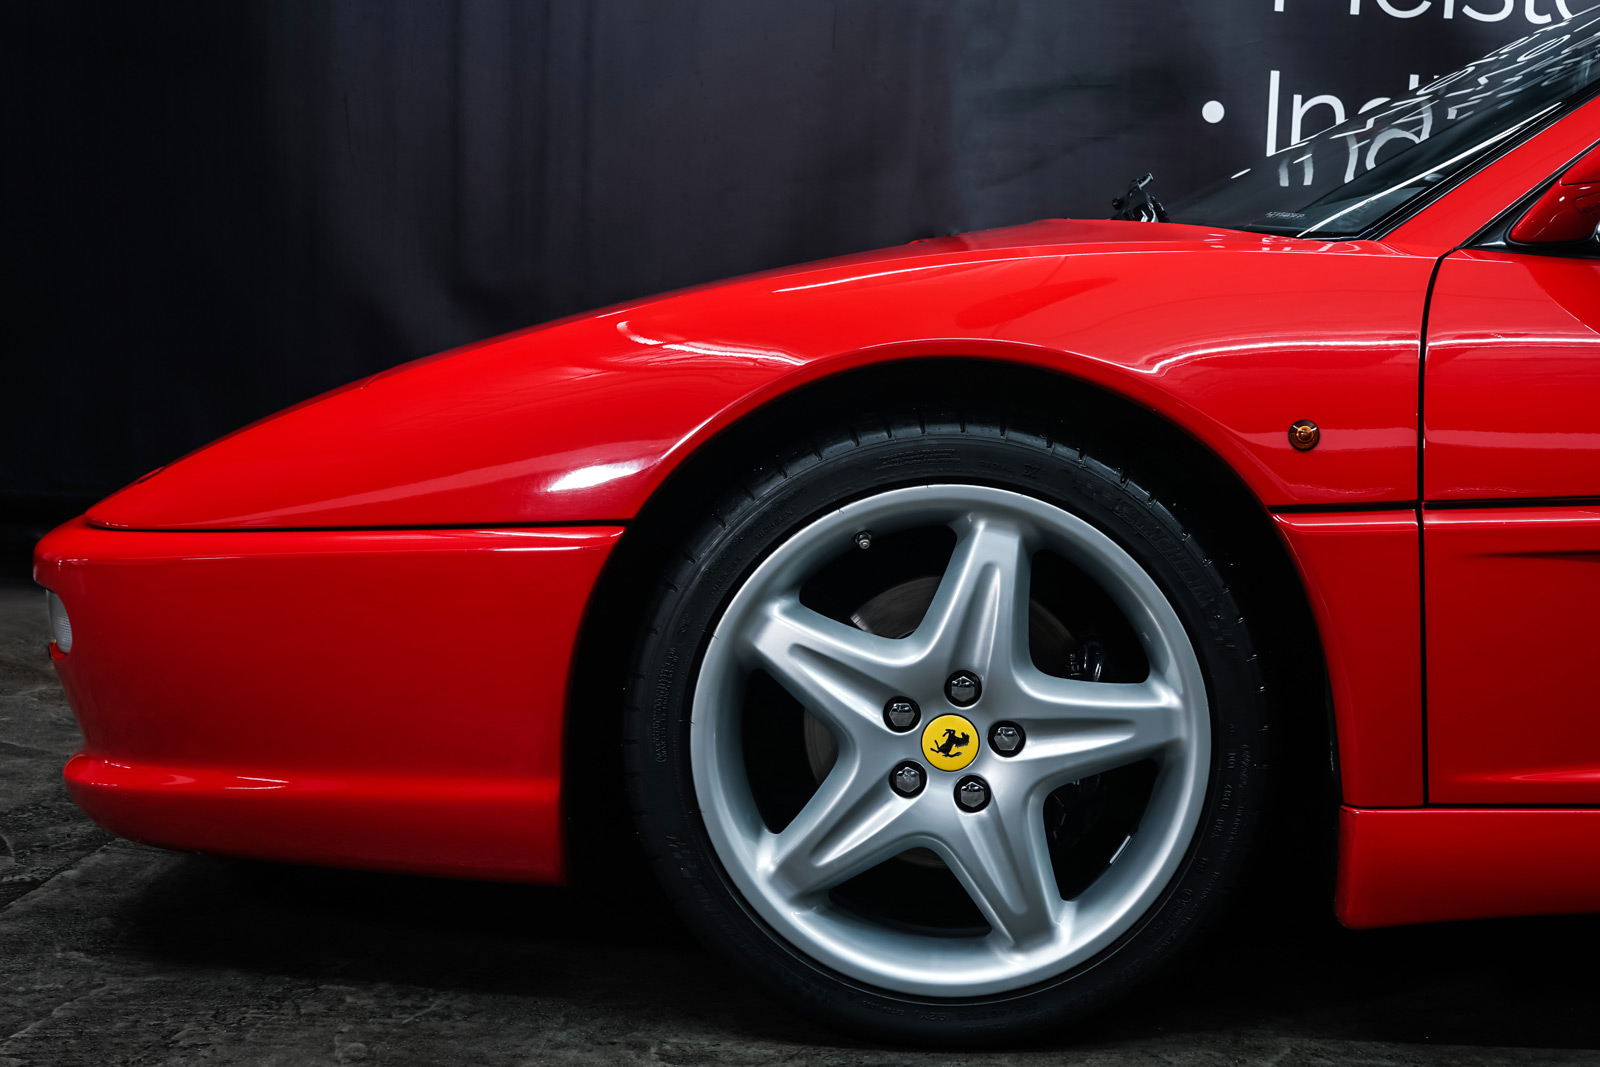 Ferrari_F355_Berlinetta_Rot_Schwarz_FER-7159_3_w